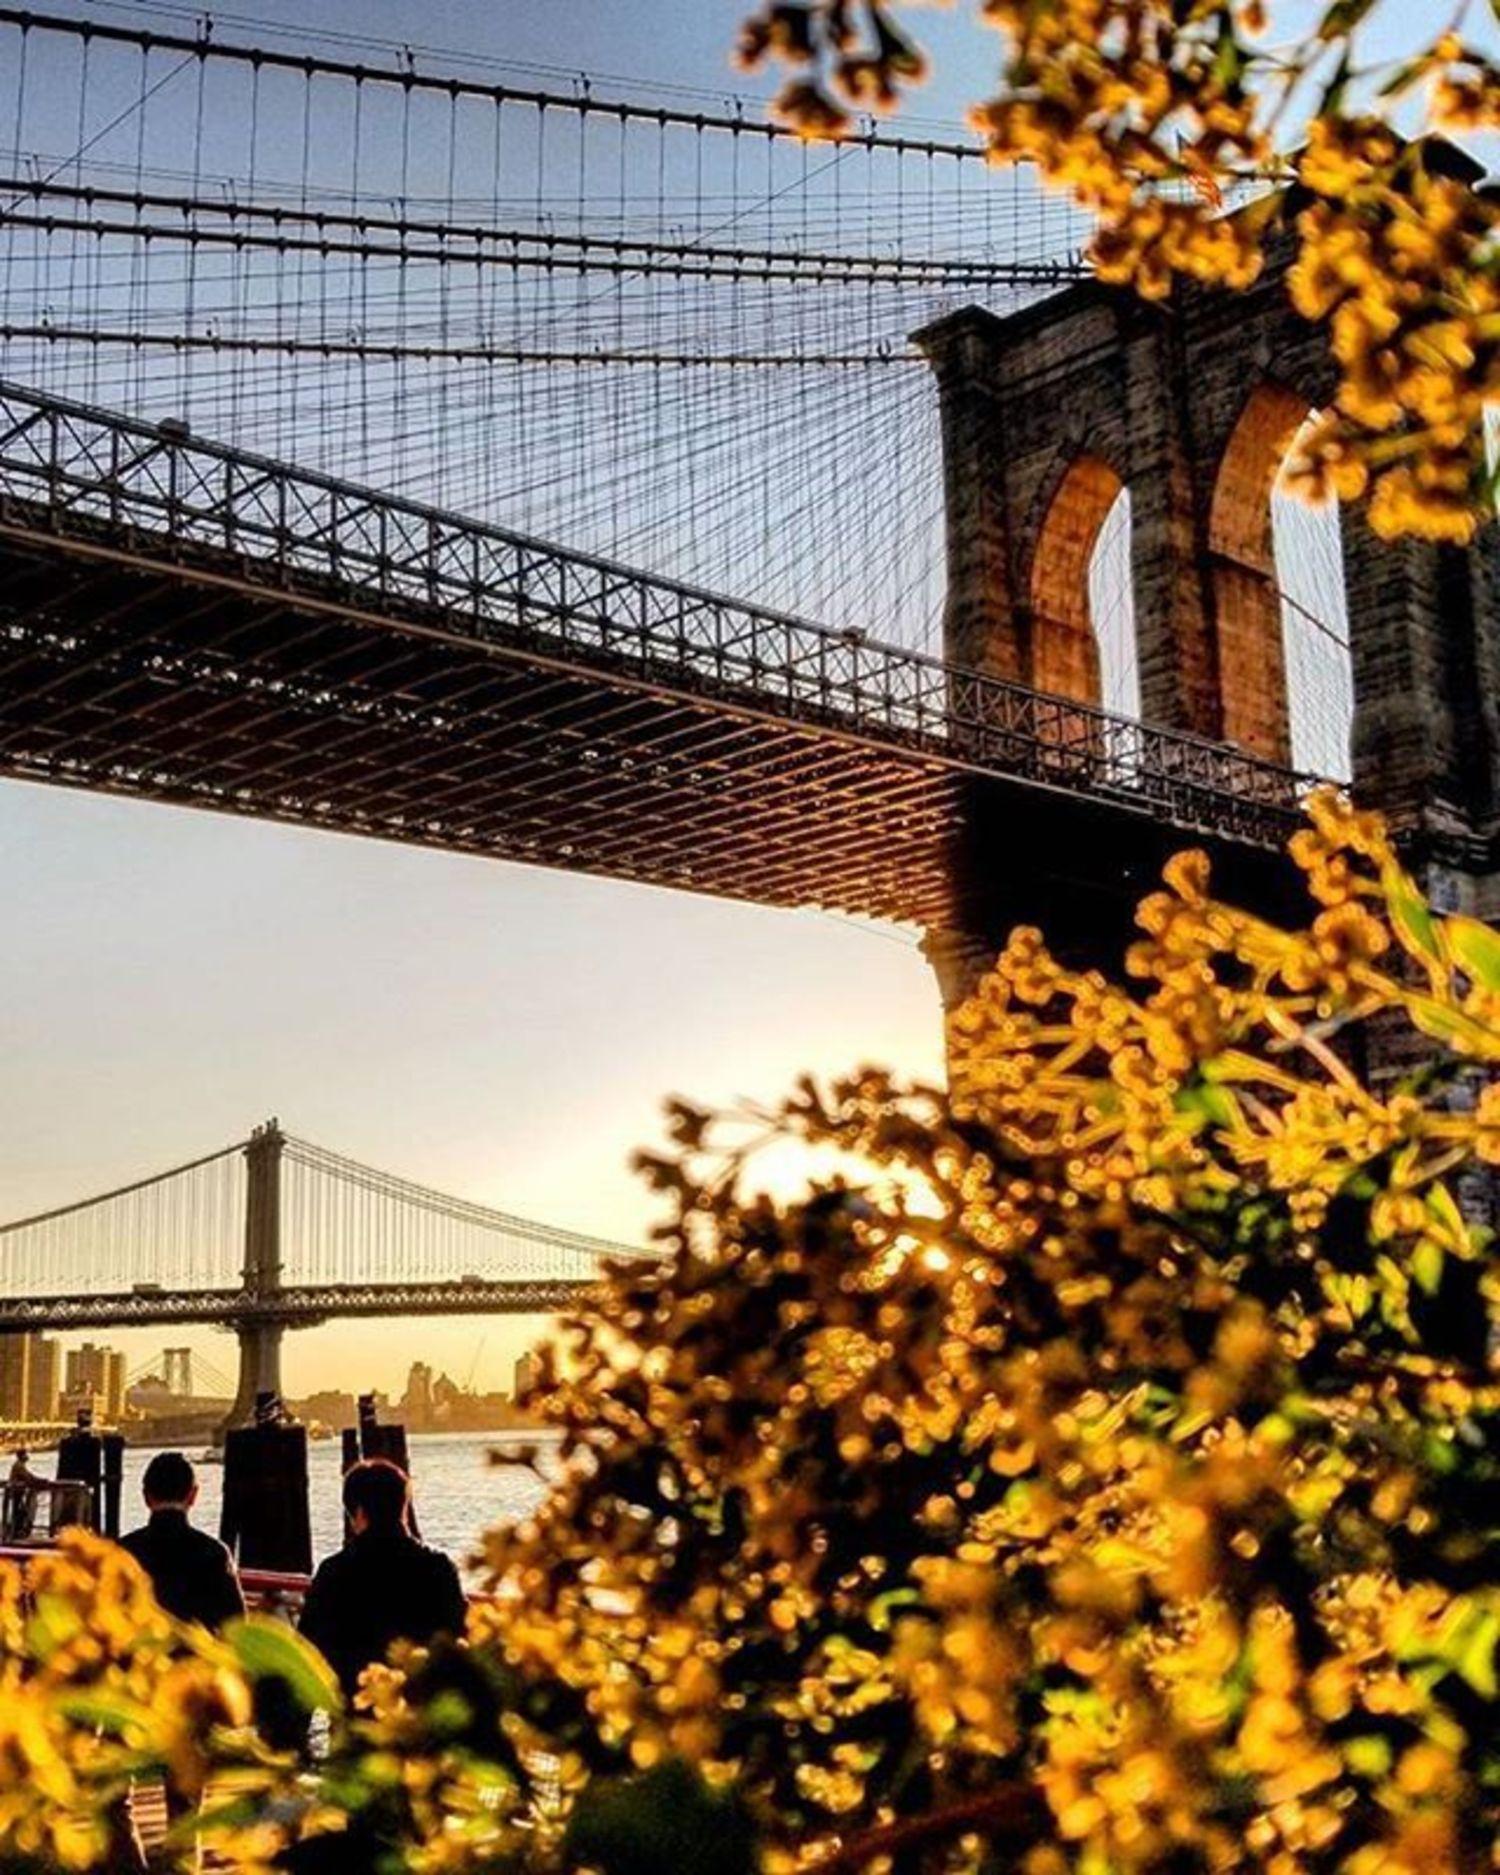 Brooklyn Bridge, New York. Photo via @qwqw7575 #viewingnyc #newyorkcity #newyork #nyc